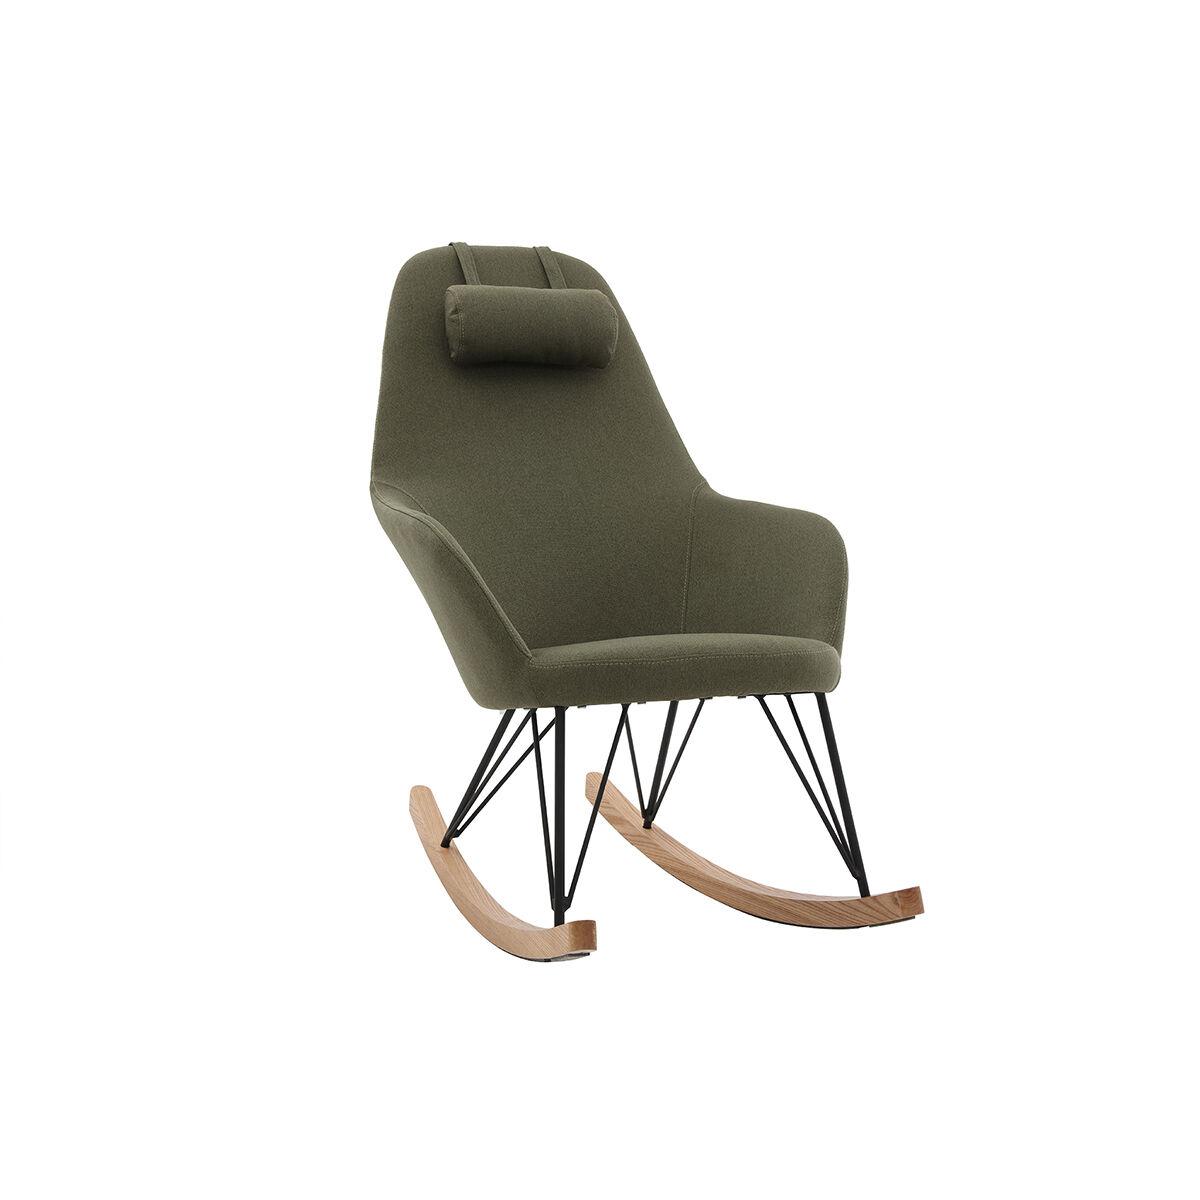 Miliboo Rocking chair scandinave kaki JHENE - Miliboo & Stéphane Plaza